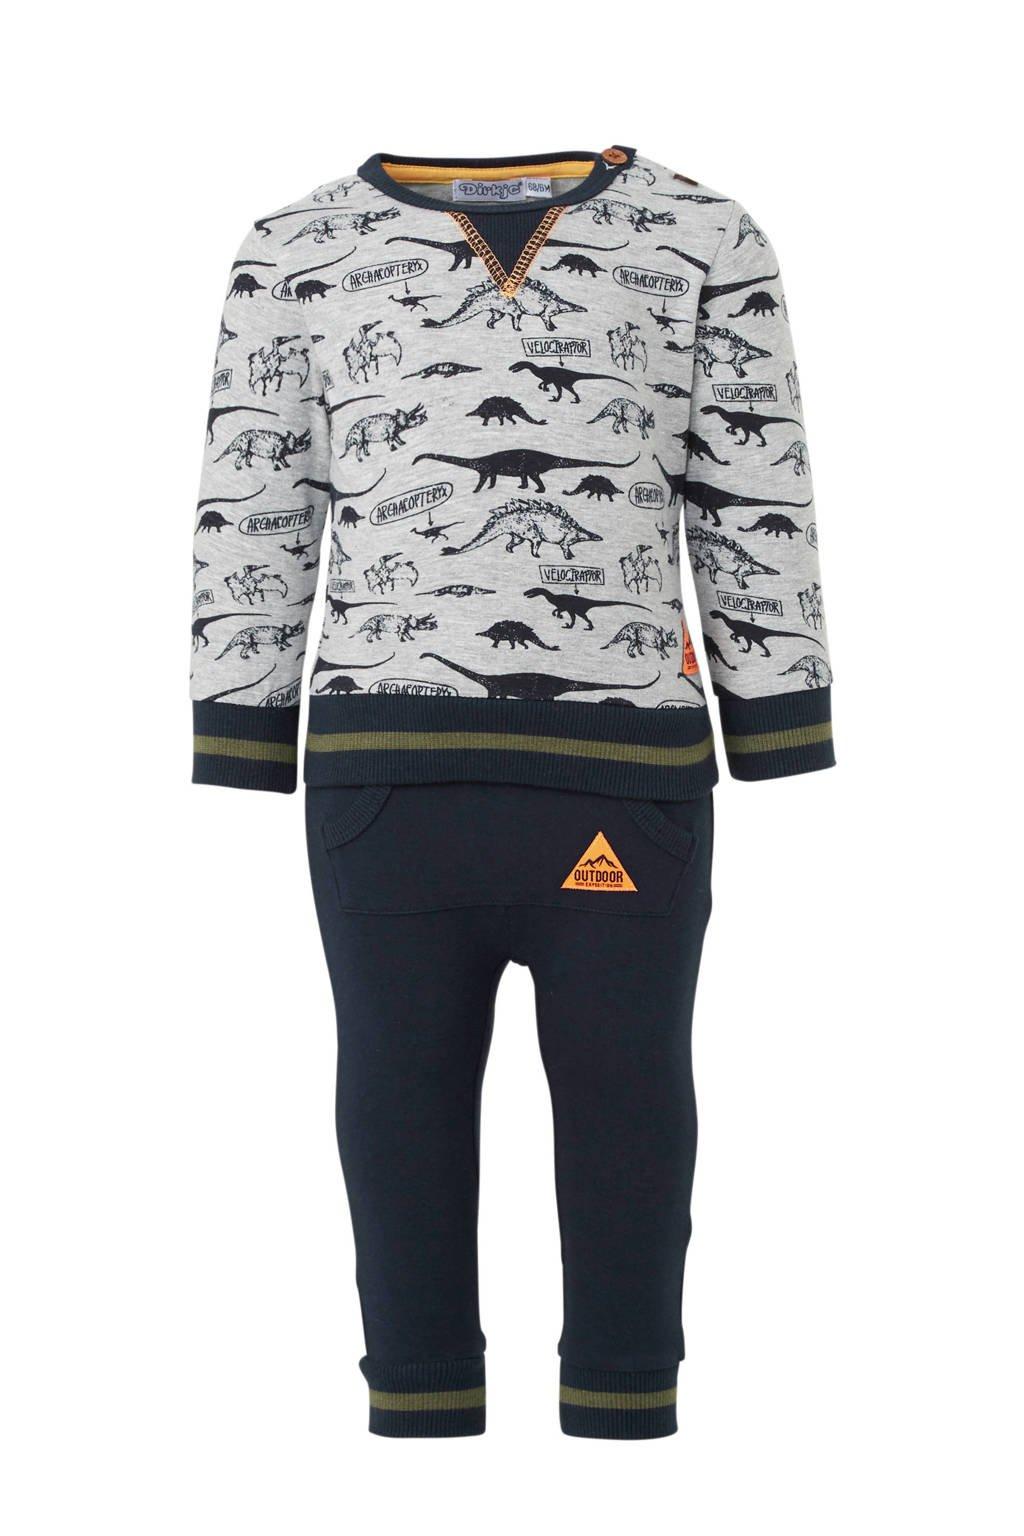 Dirkje longsleeve + joggingbroek grijs/donkerblauw, Grijs melange/donkerblauw